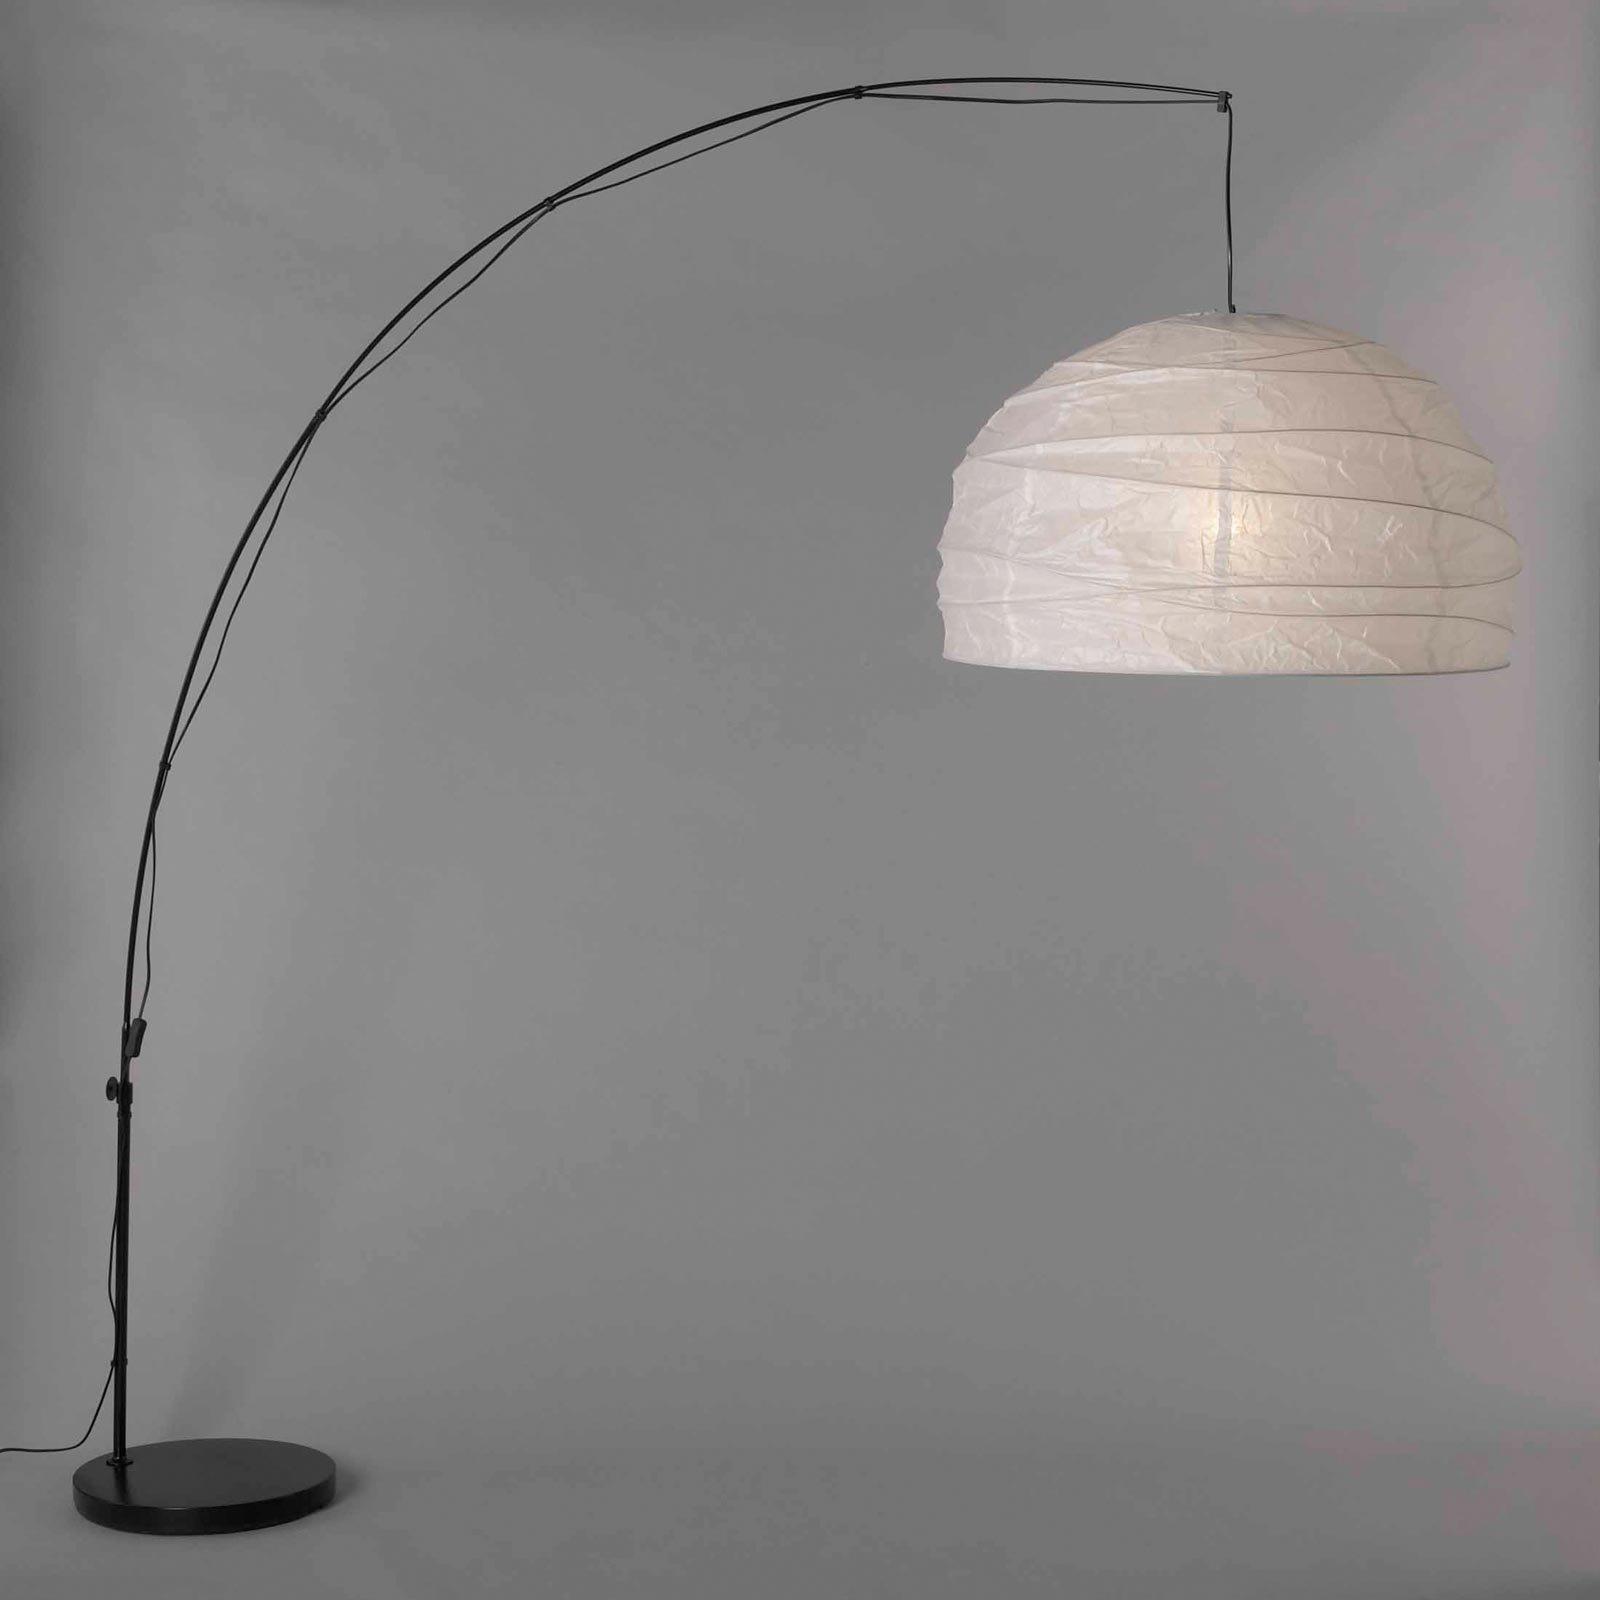 Regolit lampada da terra cose di casa for Lampada arco